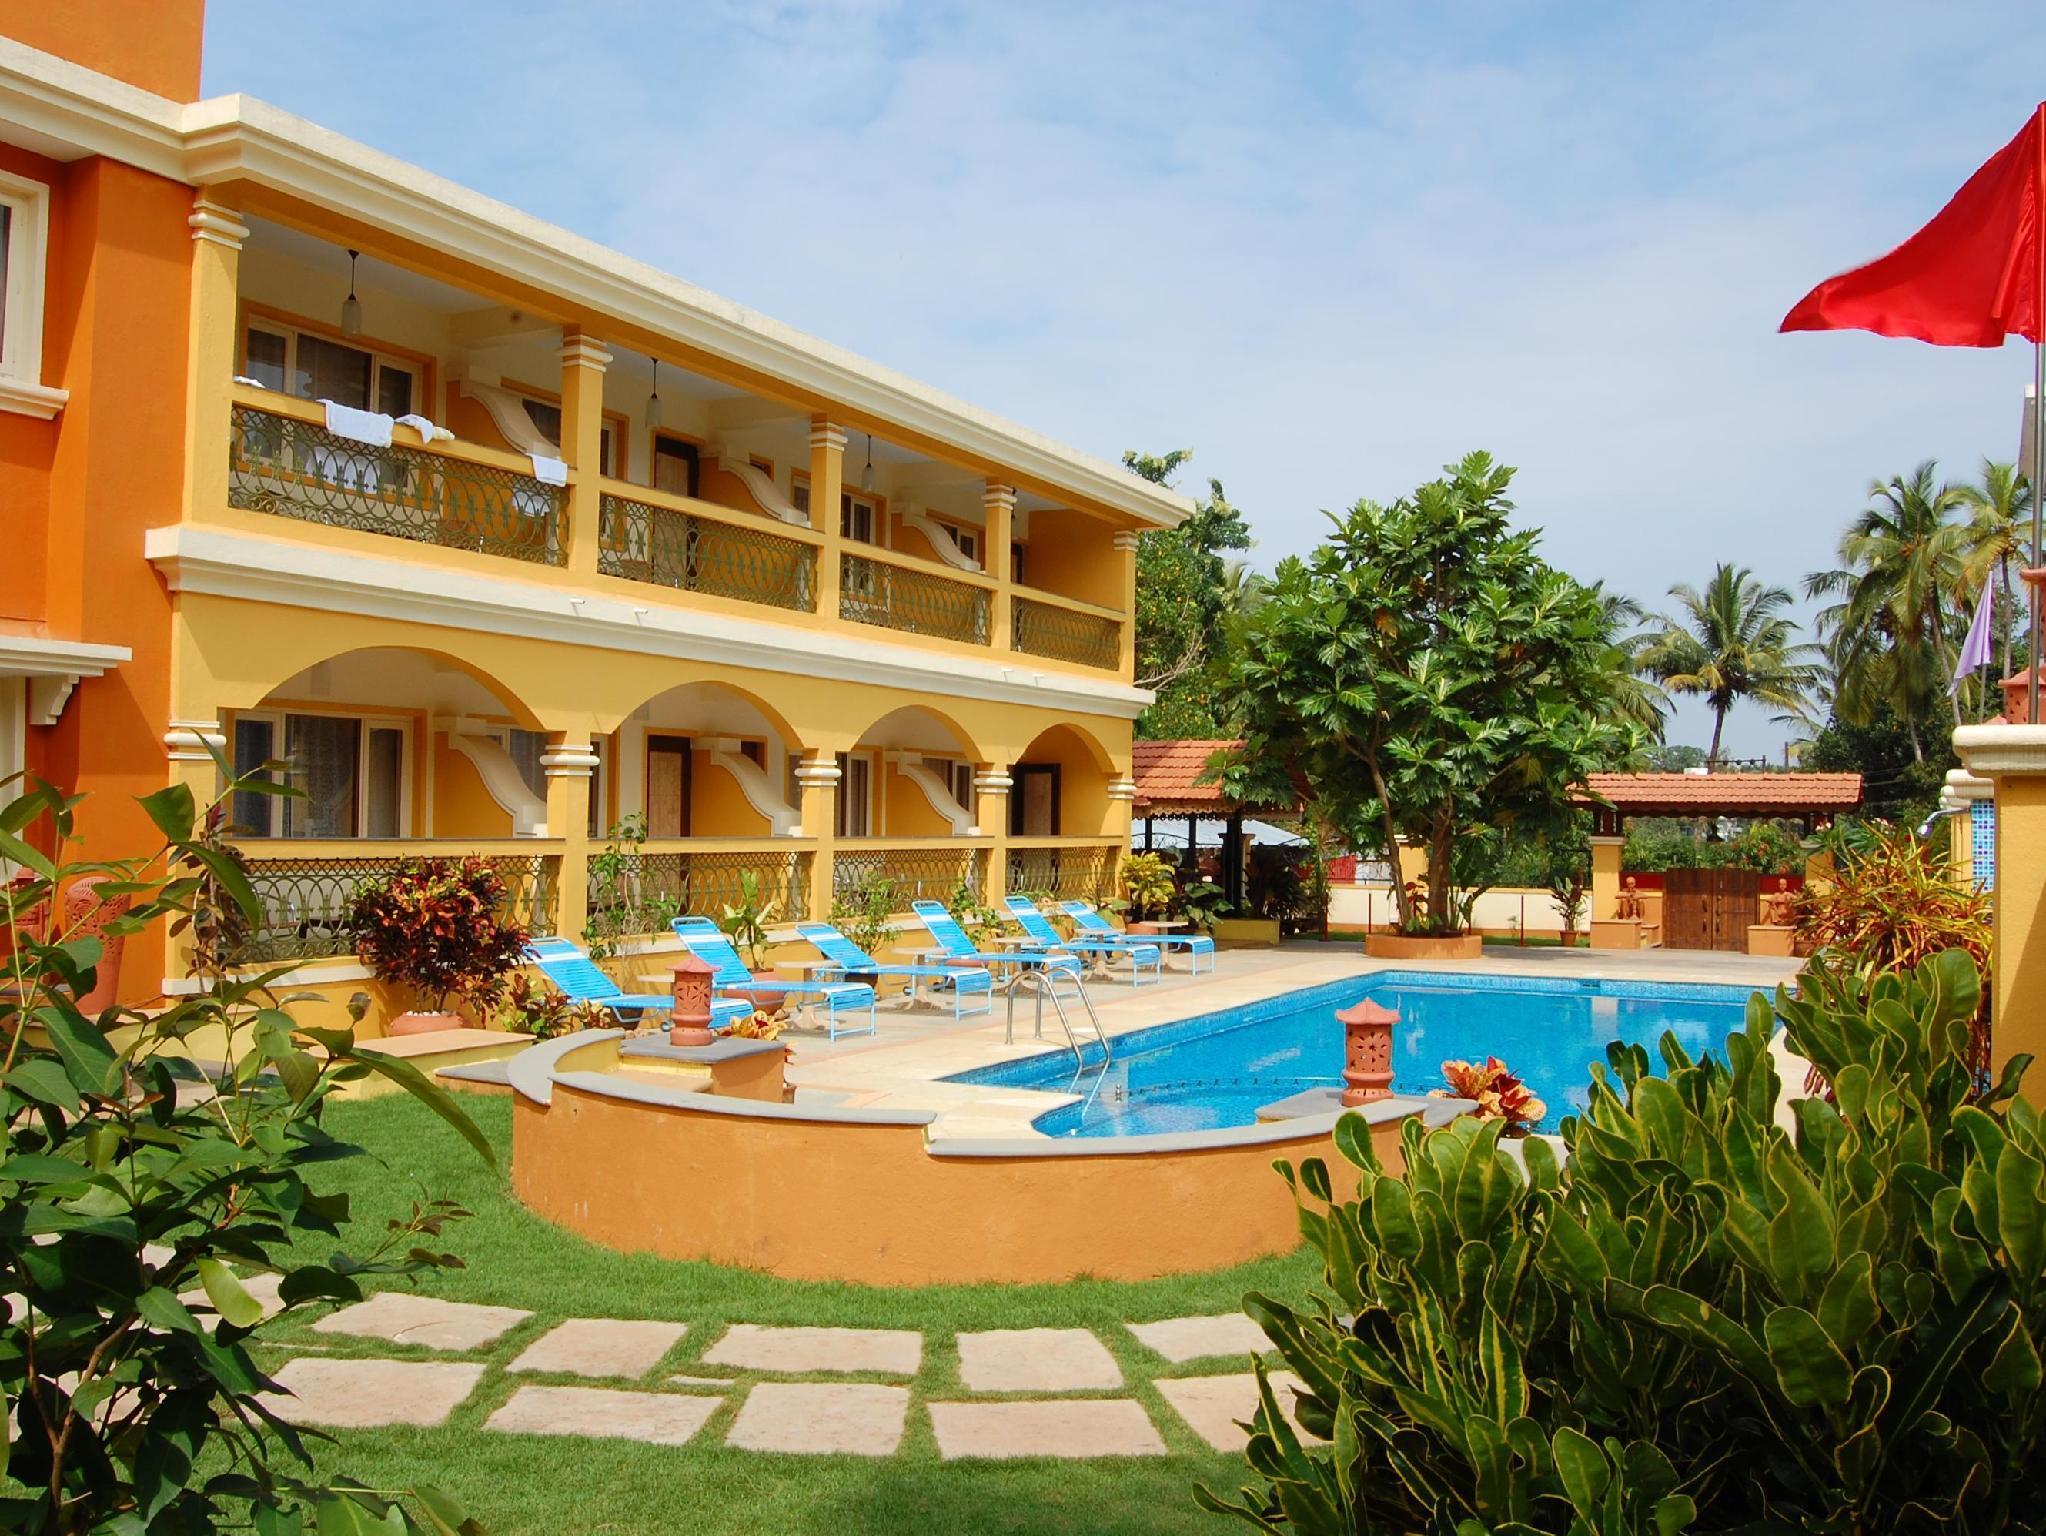 Martin's Comfort Hotel